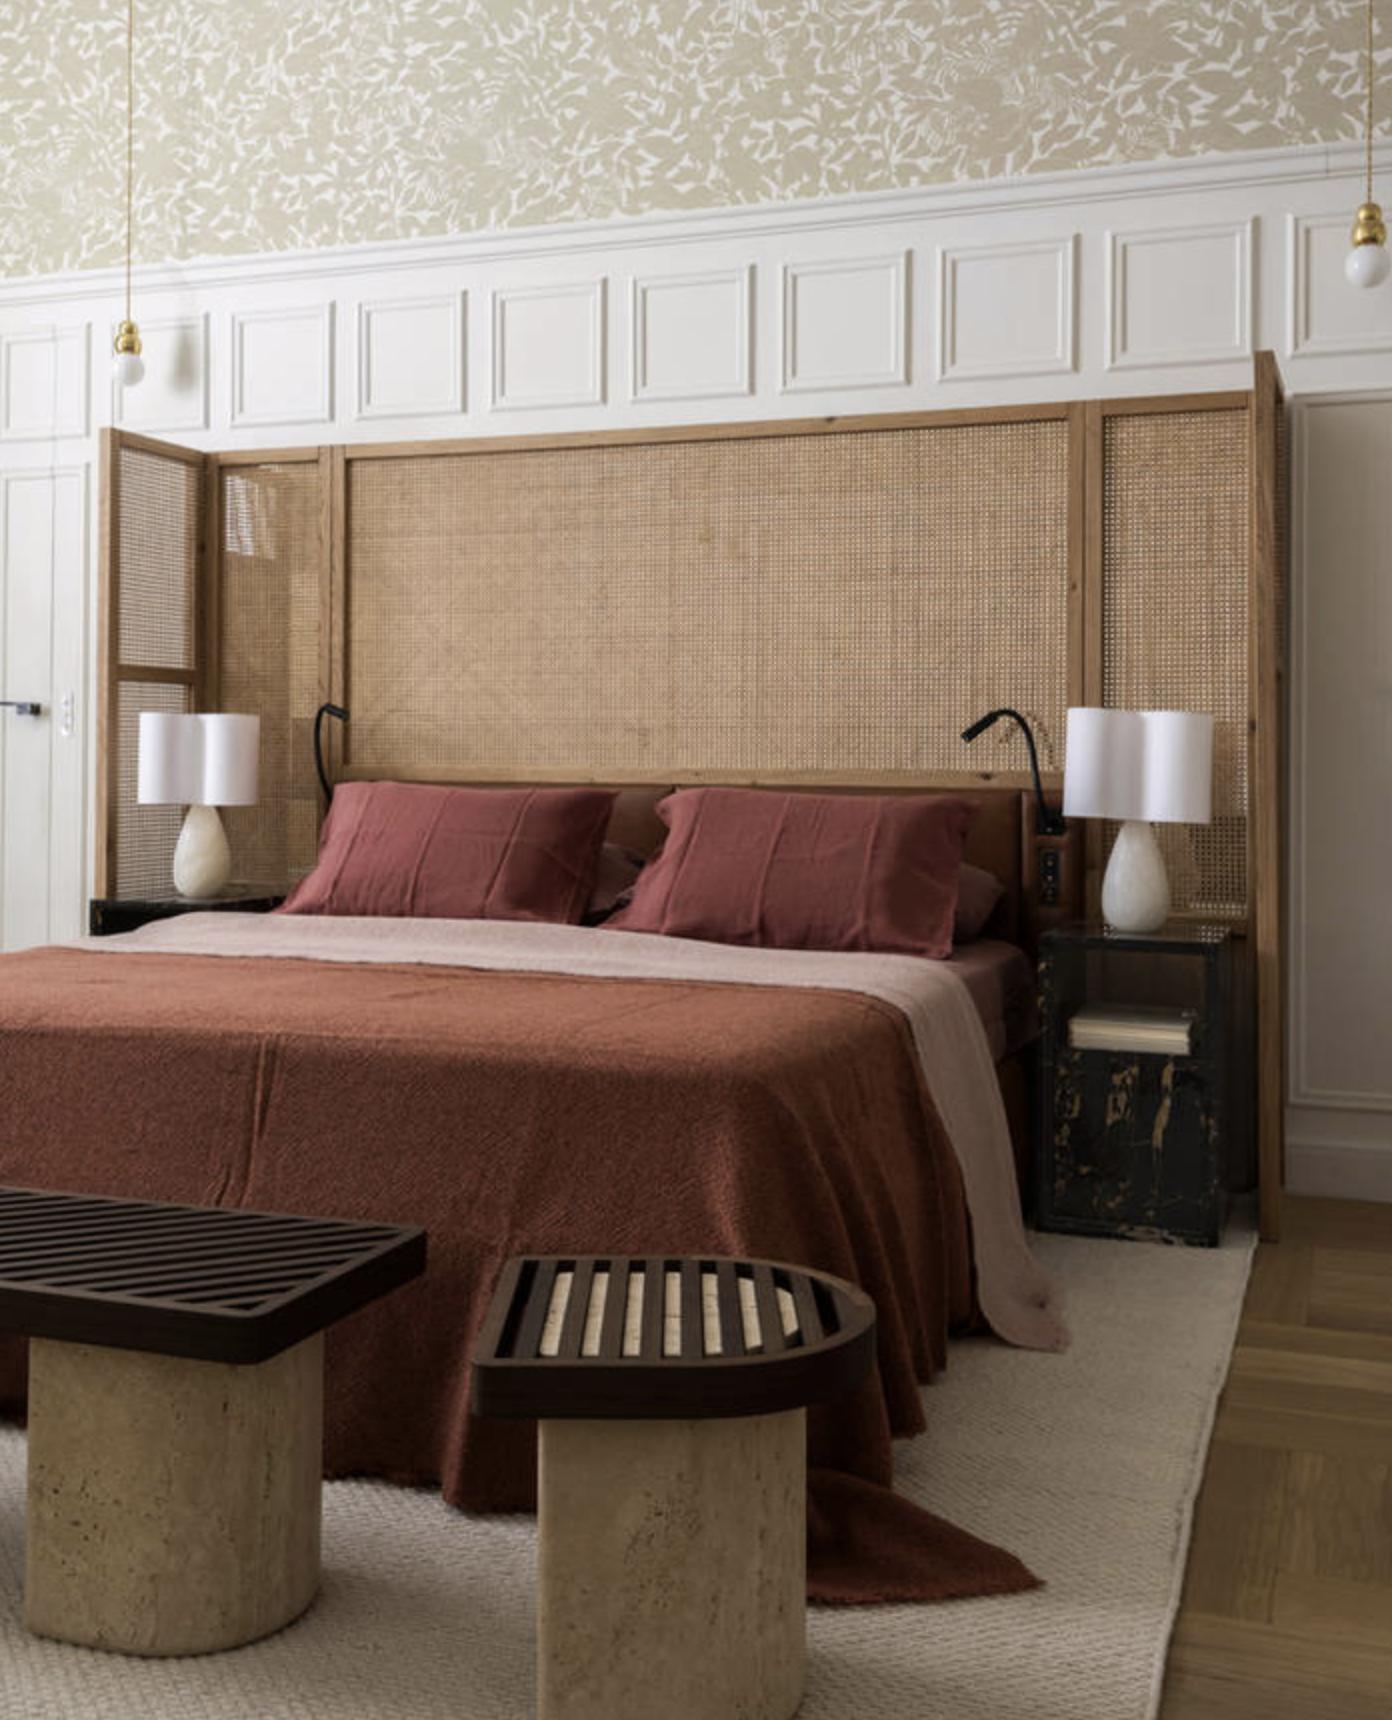 Pin By Flora Kogan On Bedroom Hotel Bedroom Design Bedroom Interior Bedroom Hotel